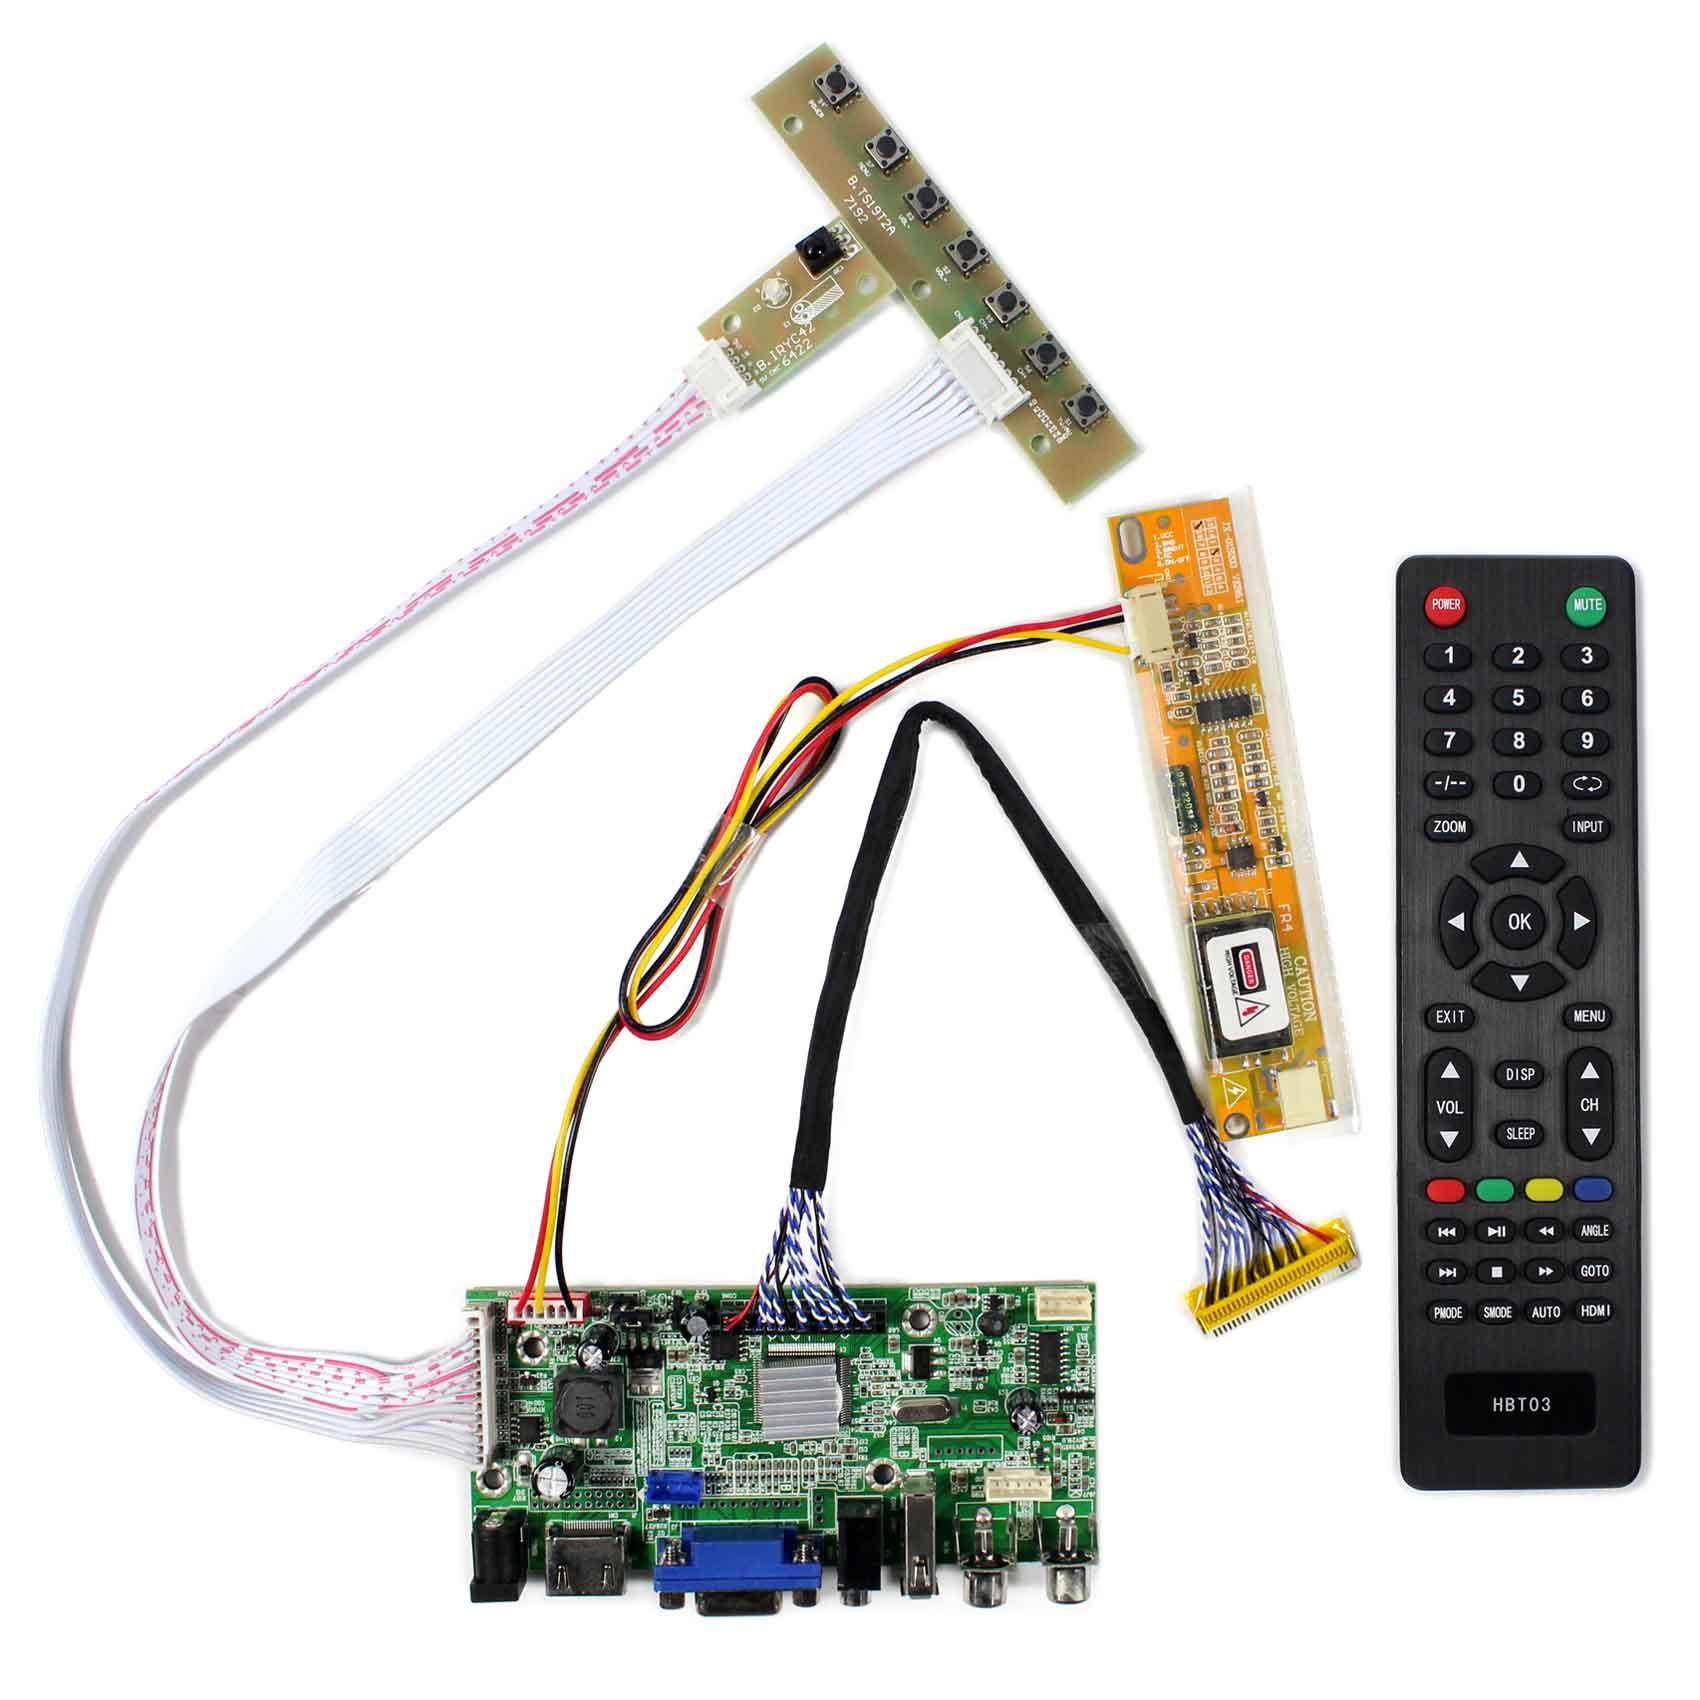 HDMI+VGA+2AV+USB+Audio LCD Controller Board for 15.4inch 17inch 1440x900 LP154WP1 B170PW03 LCD Screen hdmi vga 2av audio lcd controller board for 15 6inch 1366x768 ltn156at17 b156xw02 lcd screen